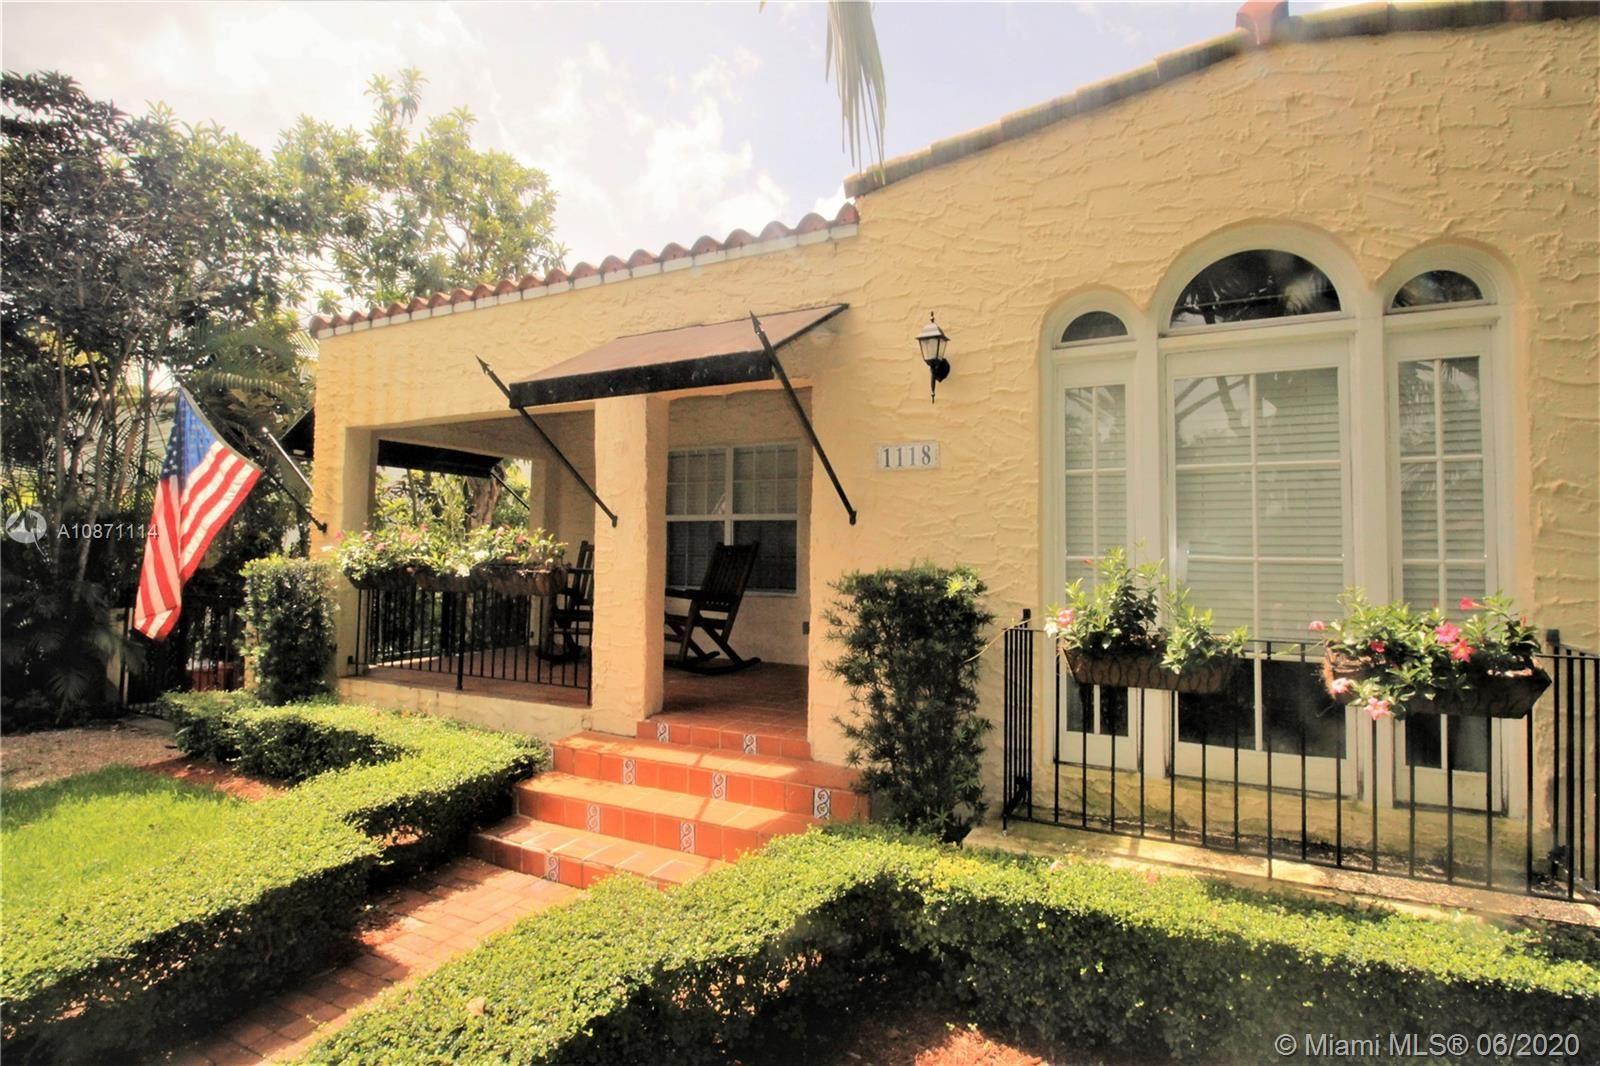 1118 Milan Ave, Coral Gables, FL 33134 - #: A10871114